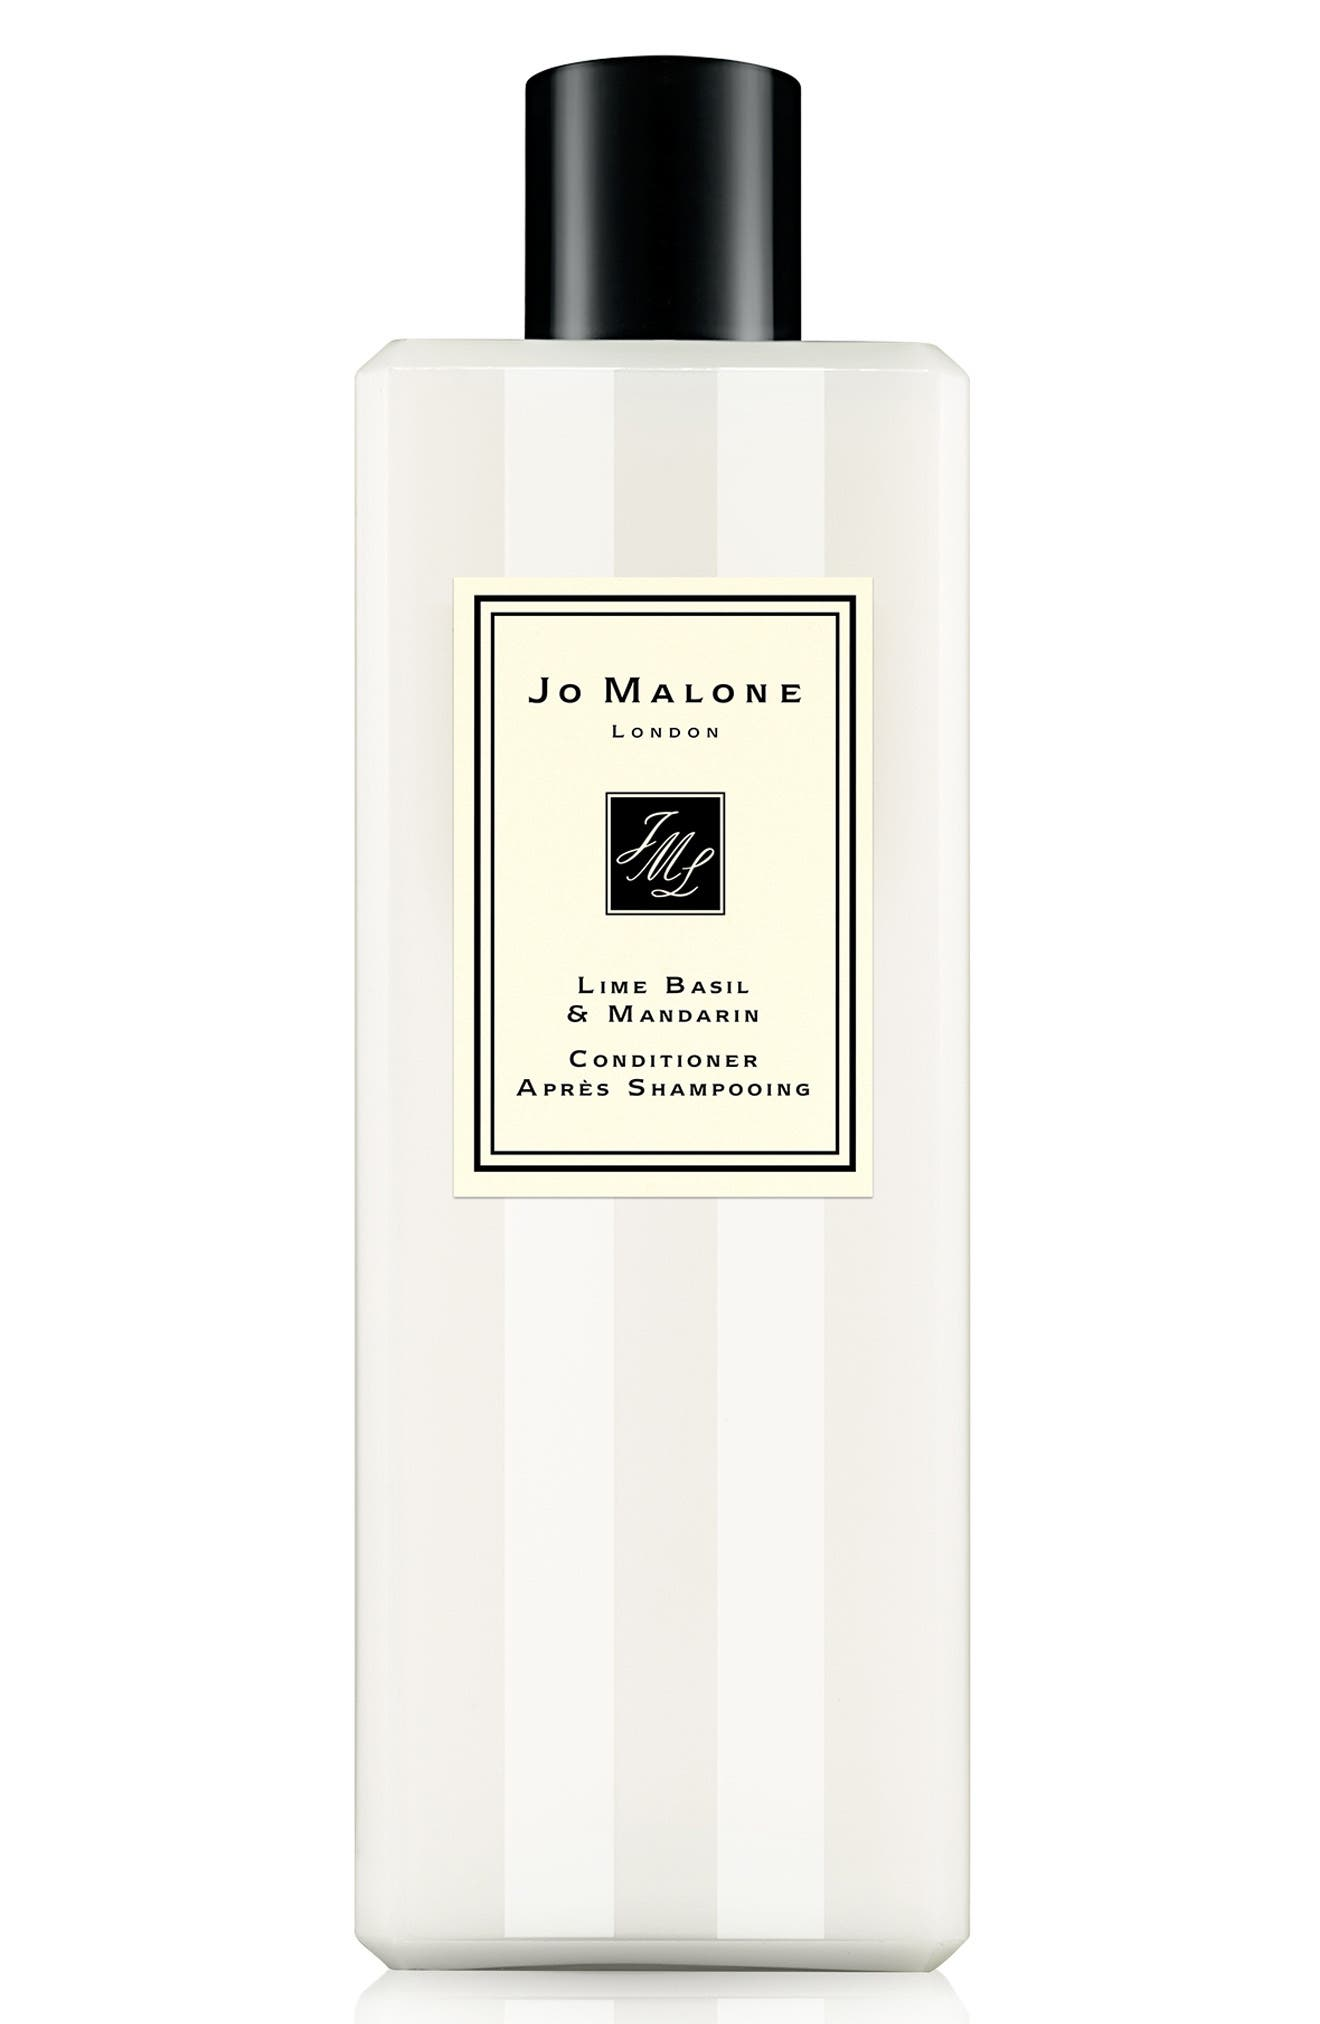 Jo Malone London™ Lime Basil & Mandarin Conditioner